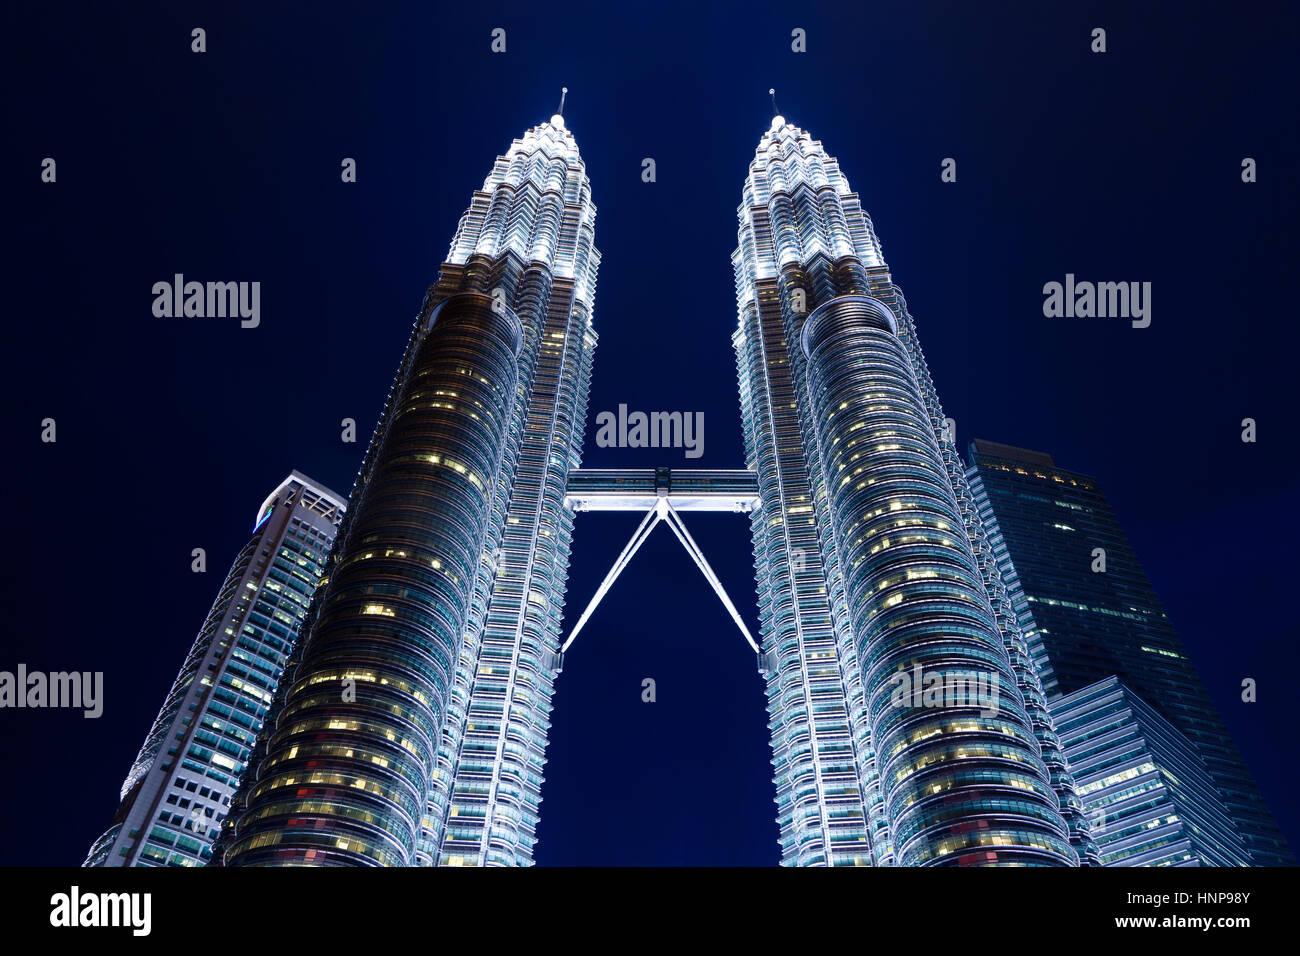 Las Torres Petronas en la noche, Kuala Lumpur, Malasia Imagen De Stock